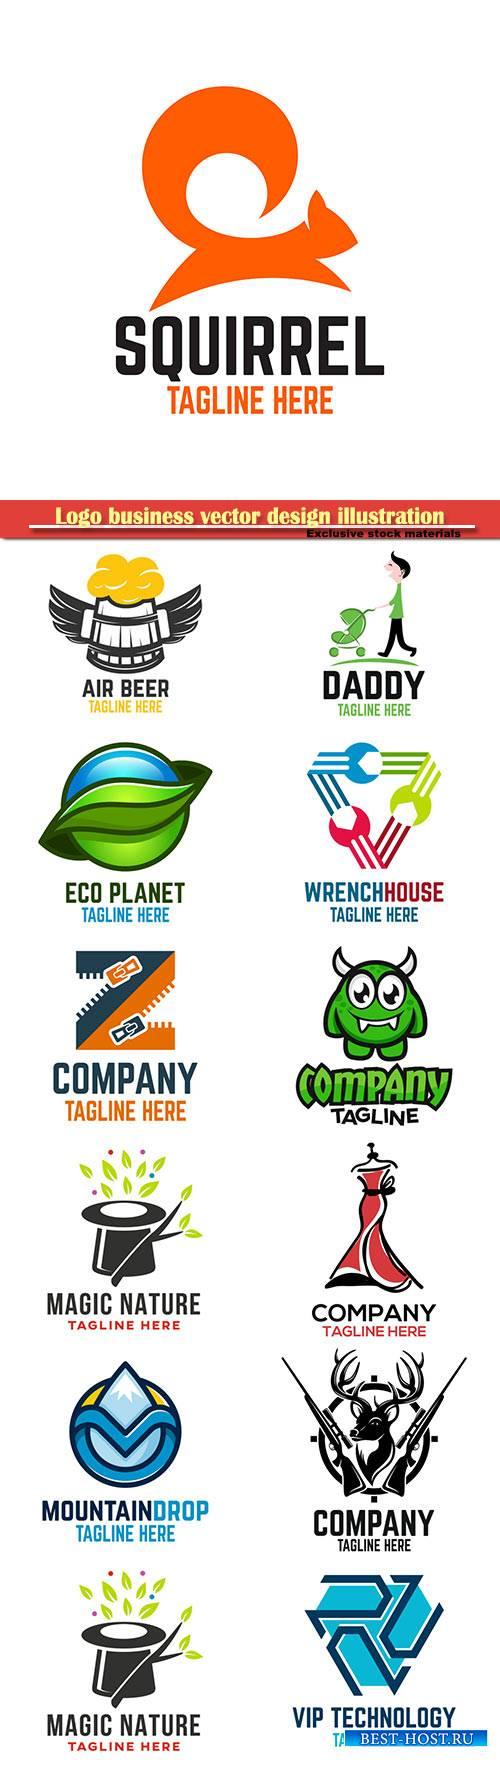 Logo business vector design illustration # 105